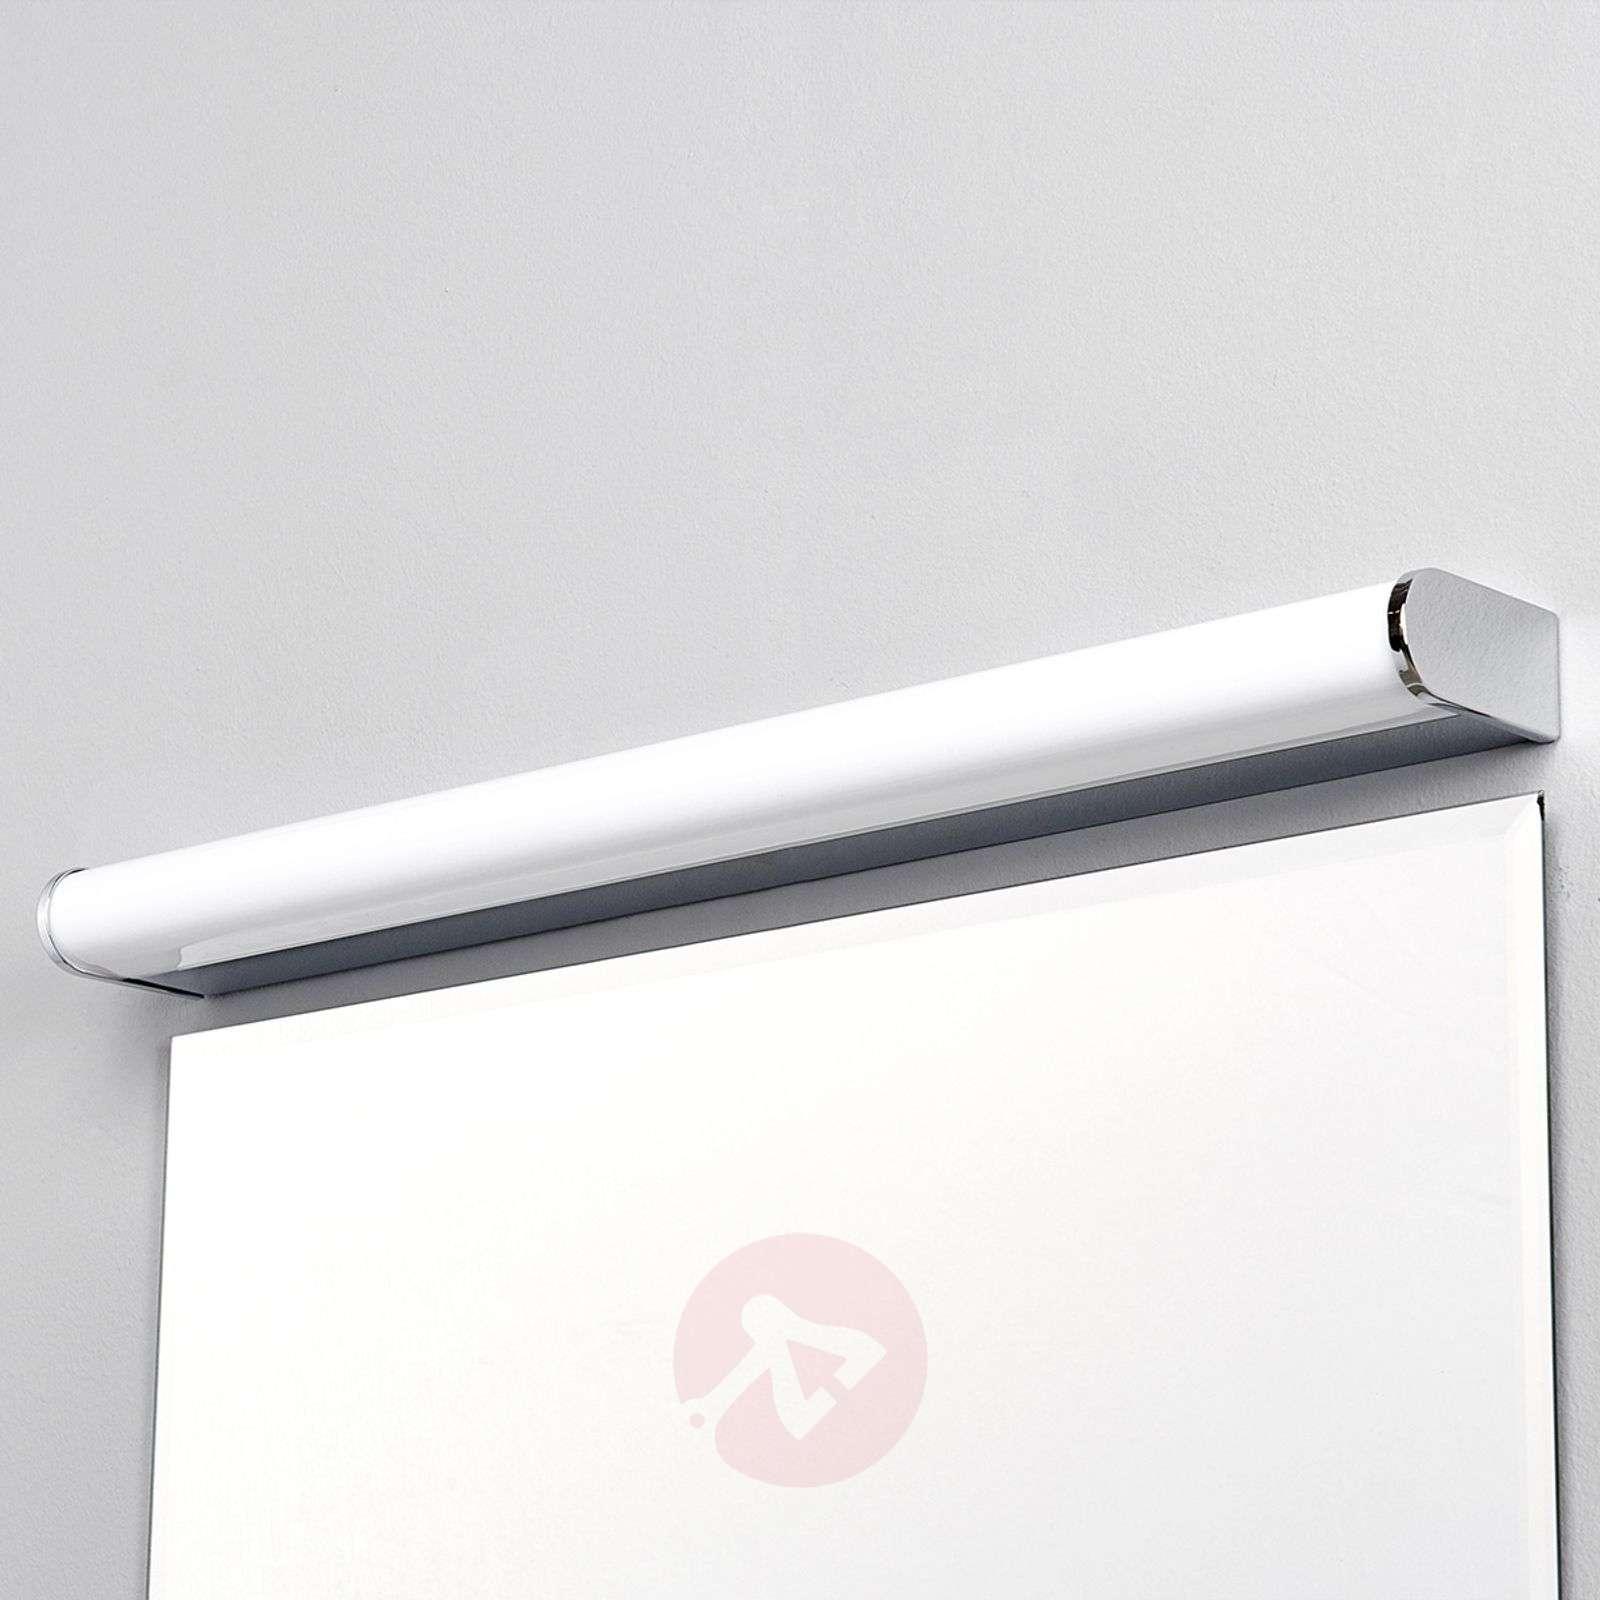 Philippa bathroom/mirror light semi-circle 58cm-9641012-03